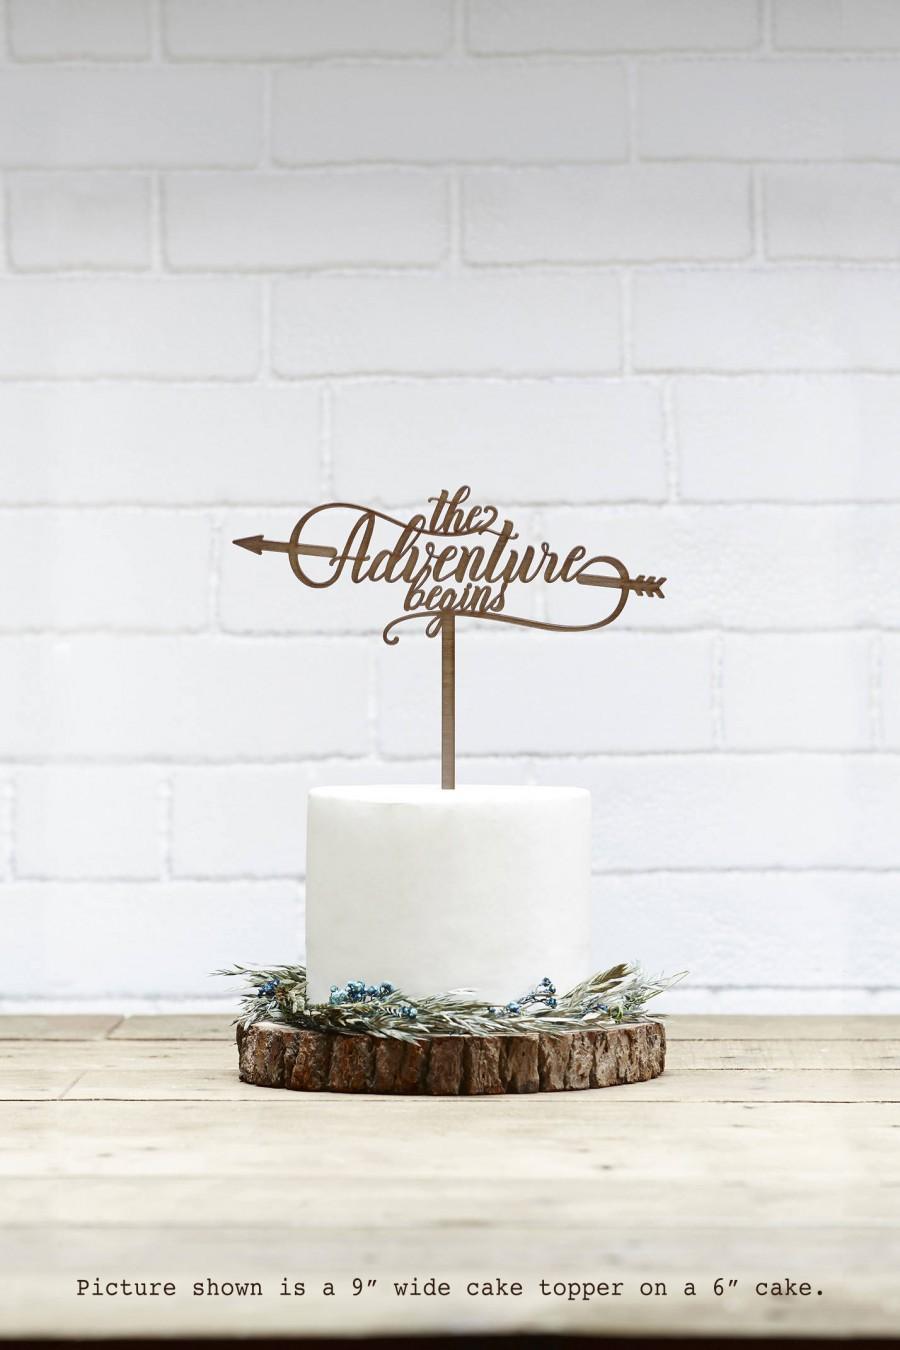 Mariage - Customized Wedding Cake Topper, Personalized Cake Topper for Wedding, Custom Personalized Wedding Cake Topper, Adventure Begins Cake Topper